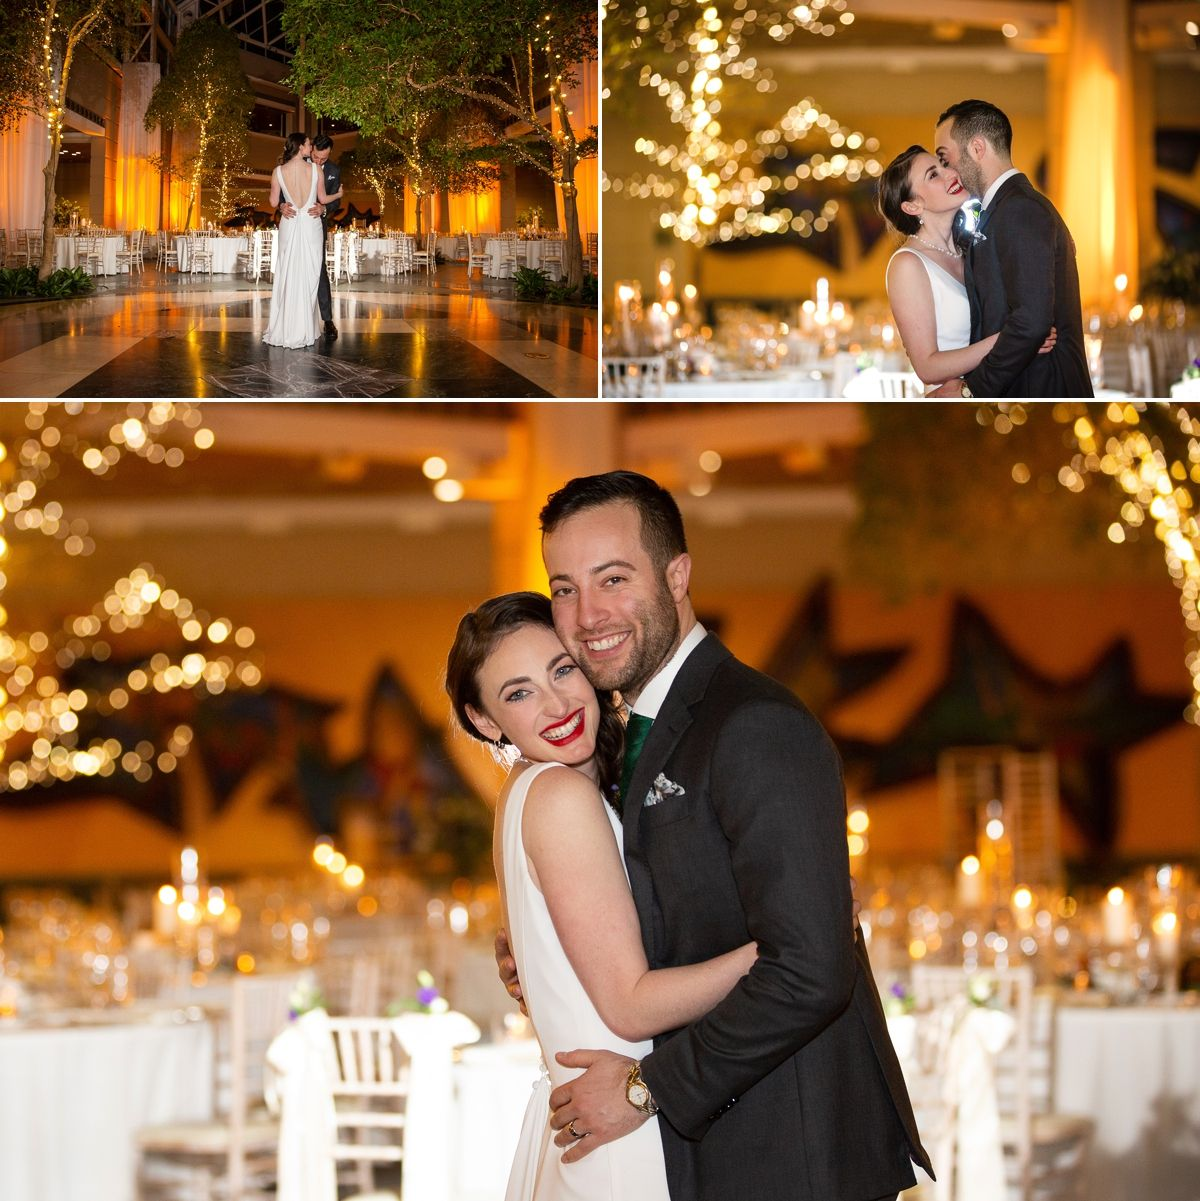 The Wintergarden By Monroe S Wedding Rochester Wedding Photographer Ny Wedding Wedding Photographers Wedding